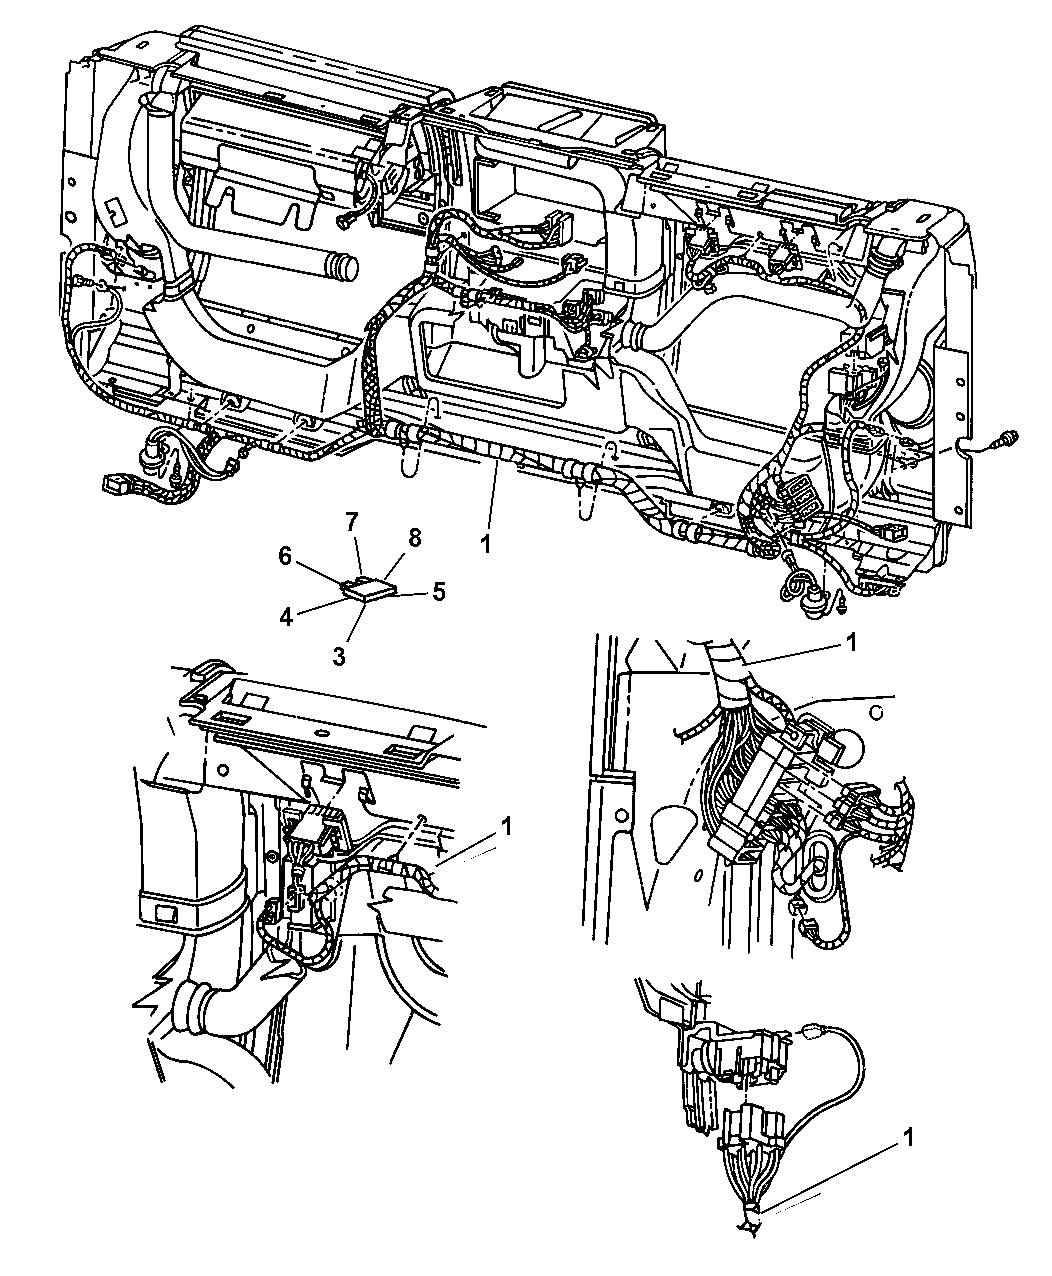 56009339 - Genuine Jeep FLASHER